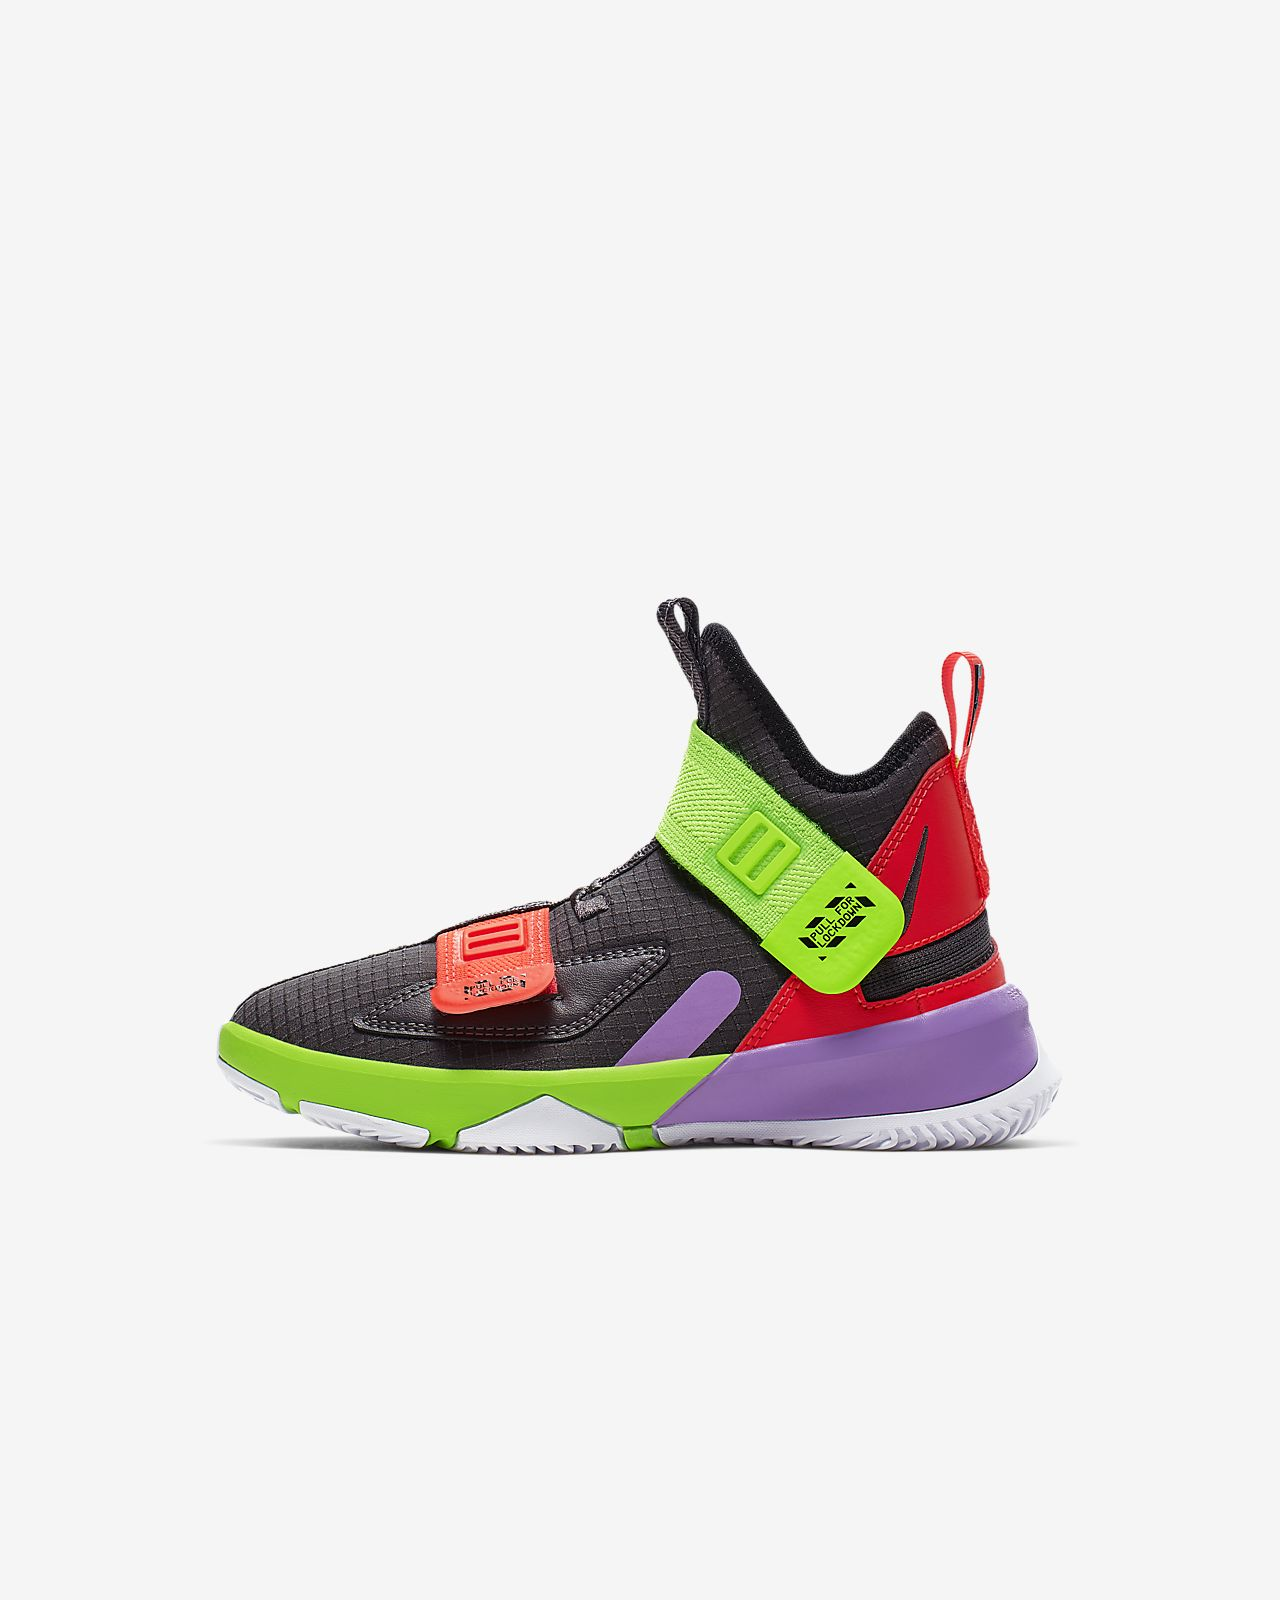 half off 9ae07 94176 LeBron Soldier 13 FlyEase Little Kids' Shoe